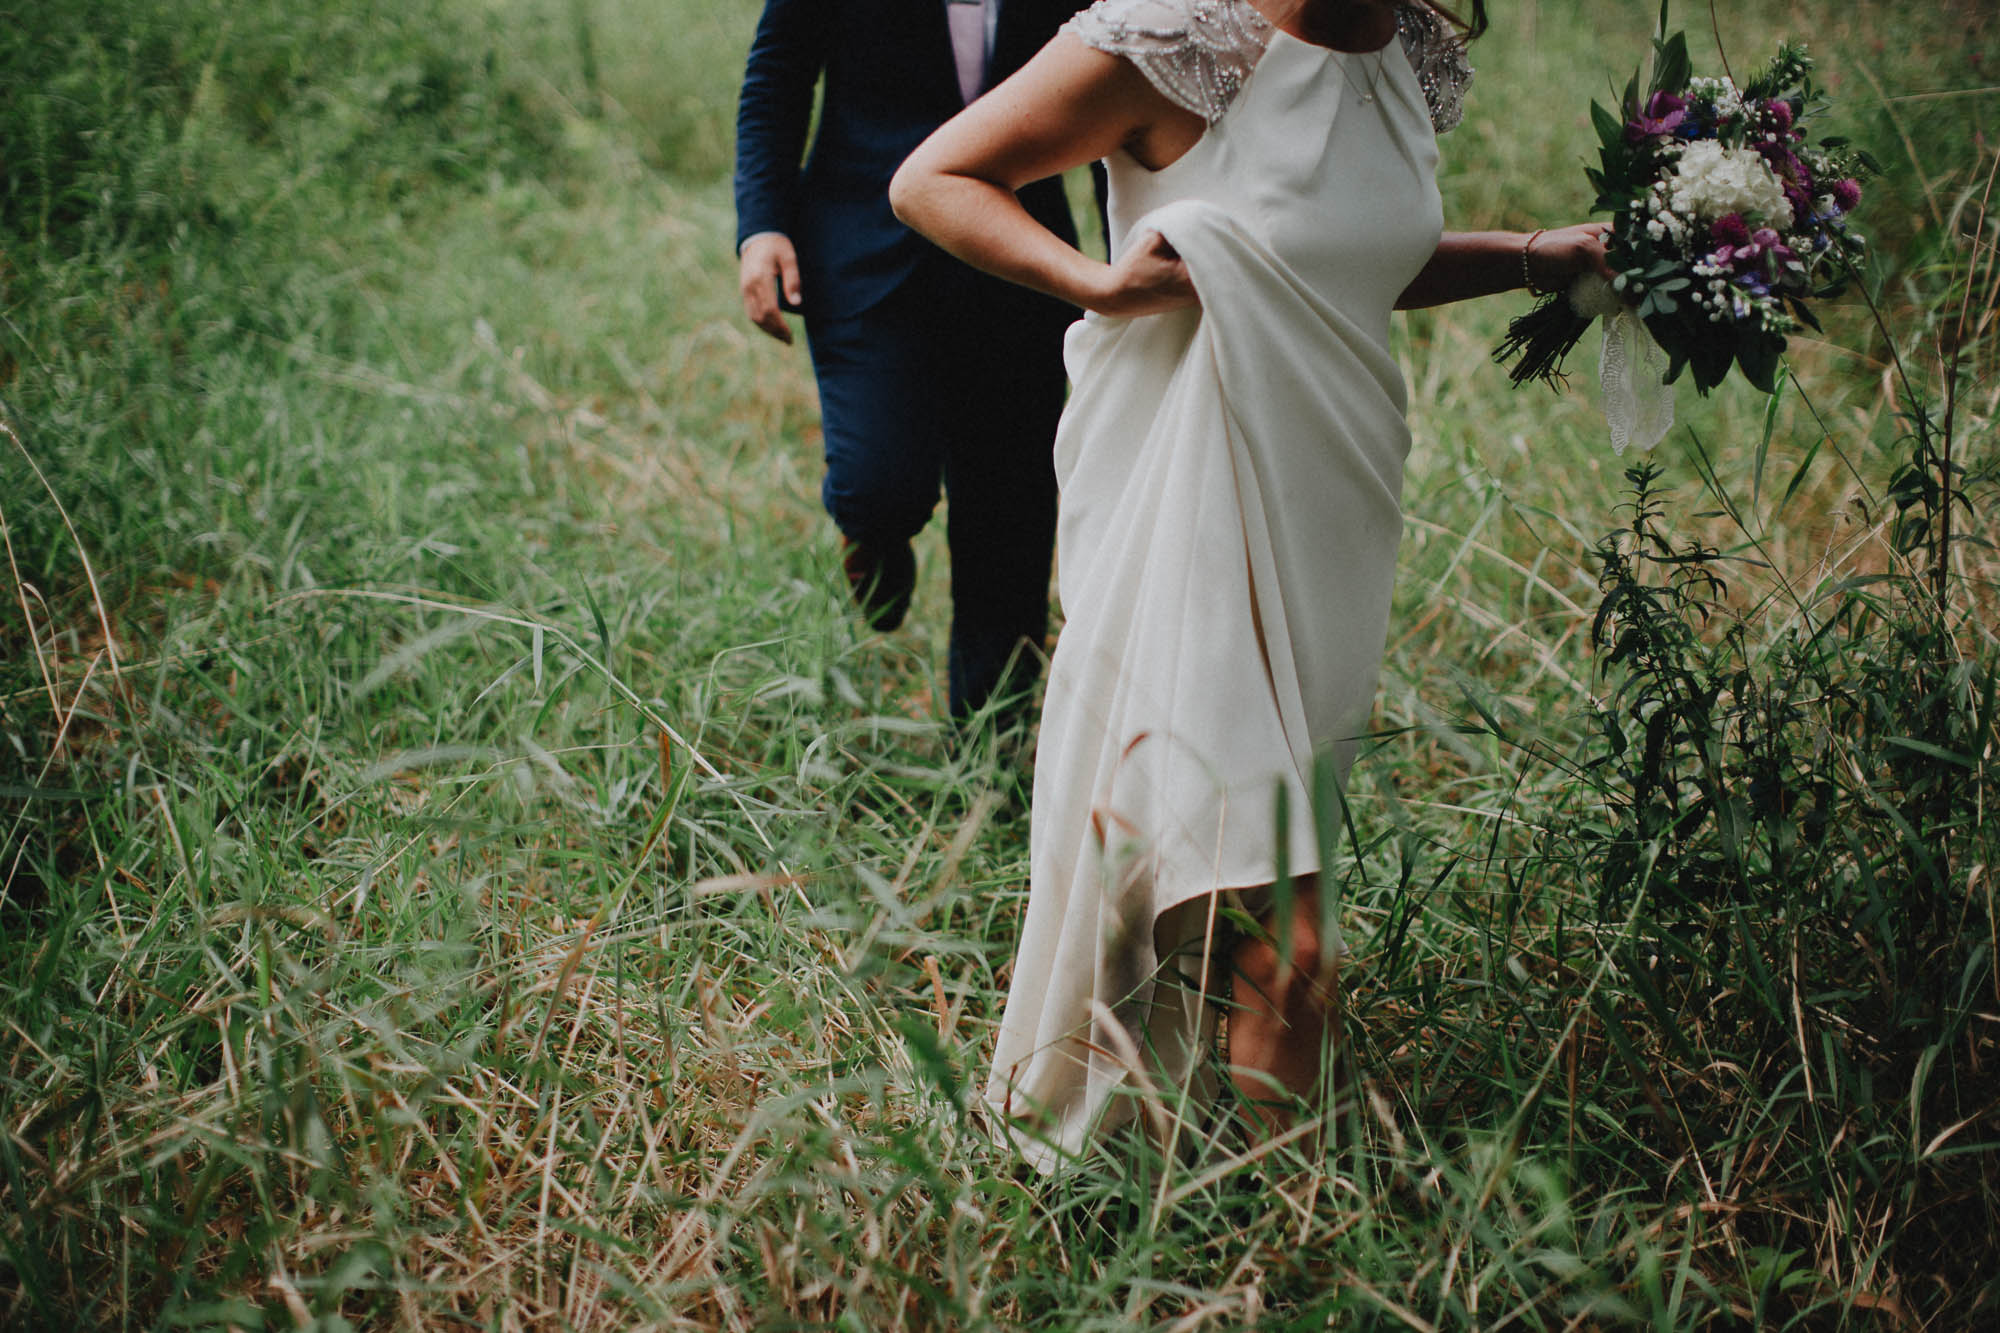 Leah-Graham-Michigan-Outdoor-DIY-Wedding-087@2x.jpg